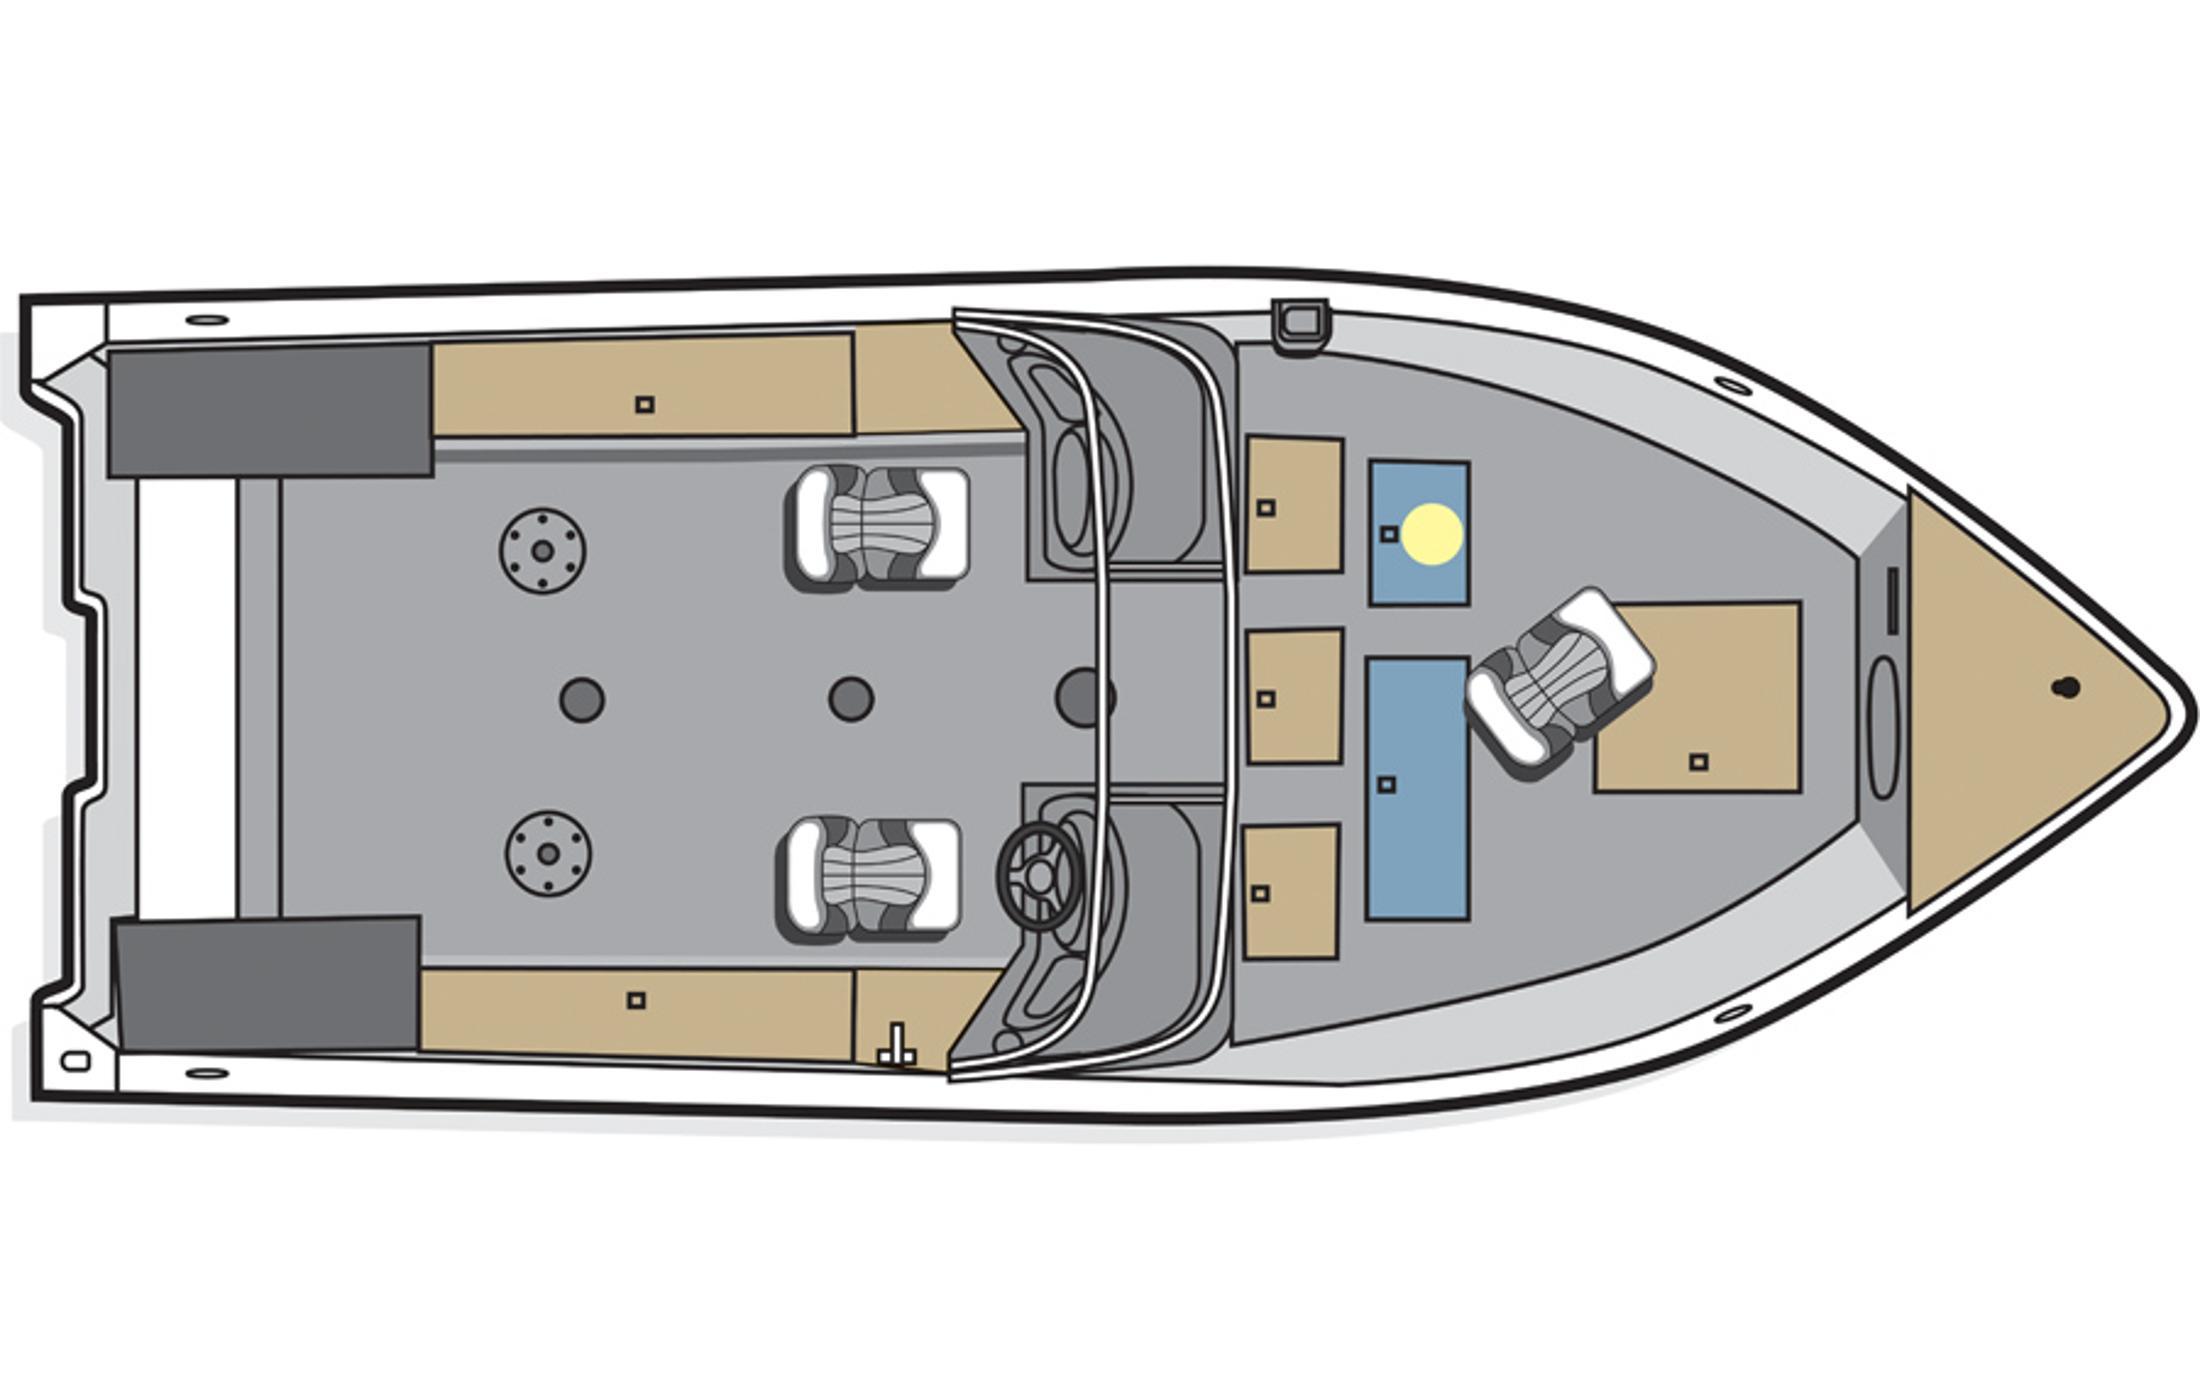 2017 Polar Kraft Outlander 2010 WT Power Boats Outboard Freeport ...